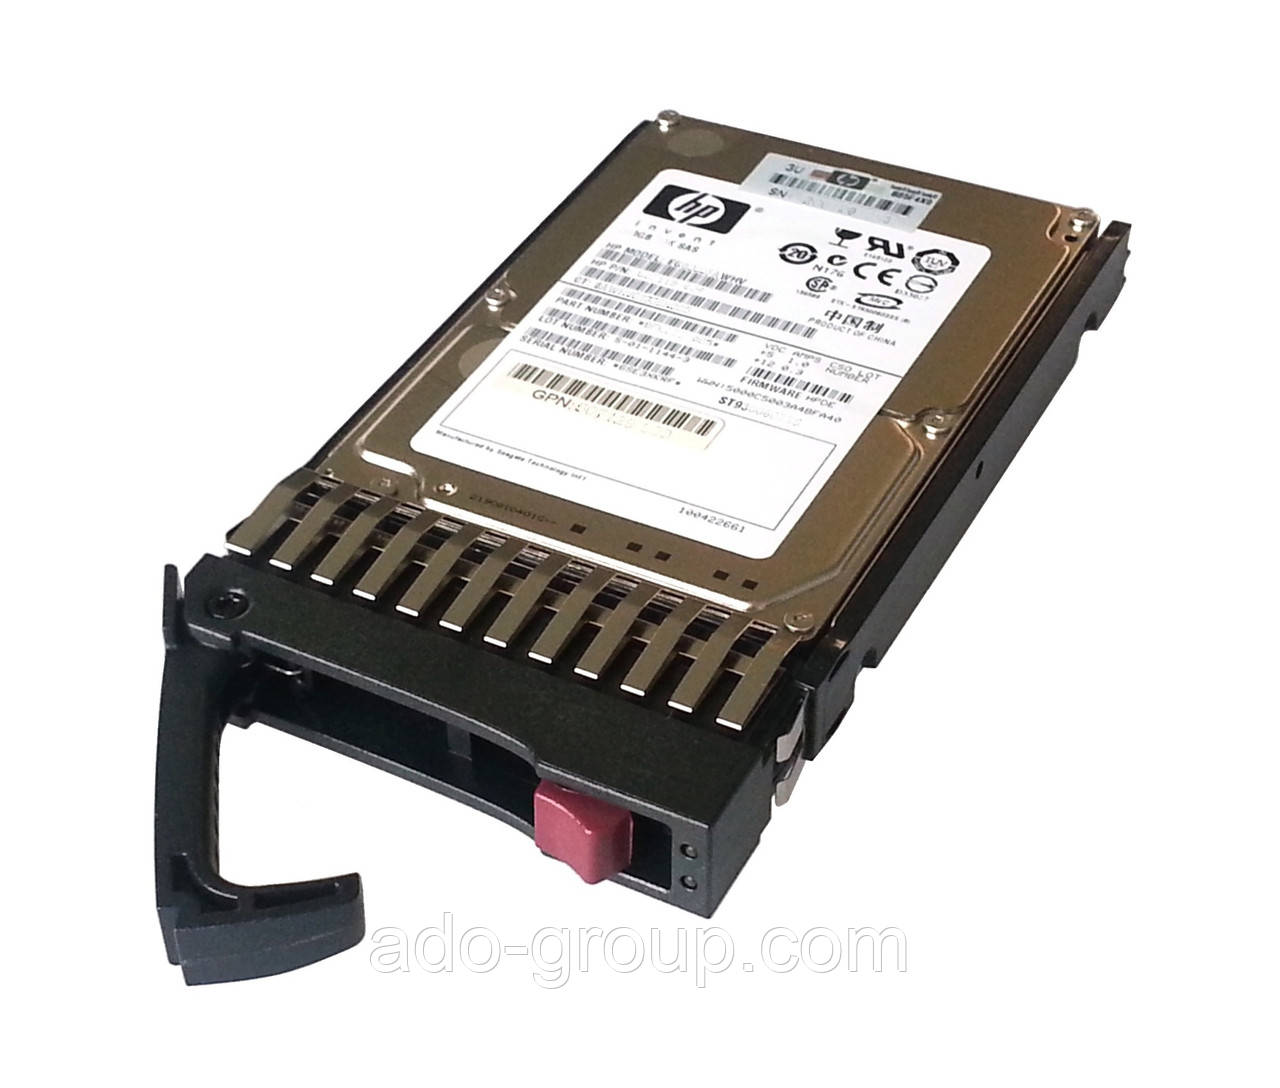 "619291-B21 Жесткий диск HP 900GB SAS 10K 6G DP 2.5"""